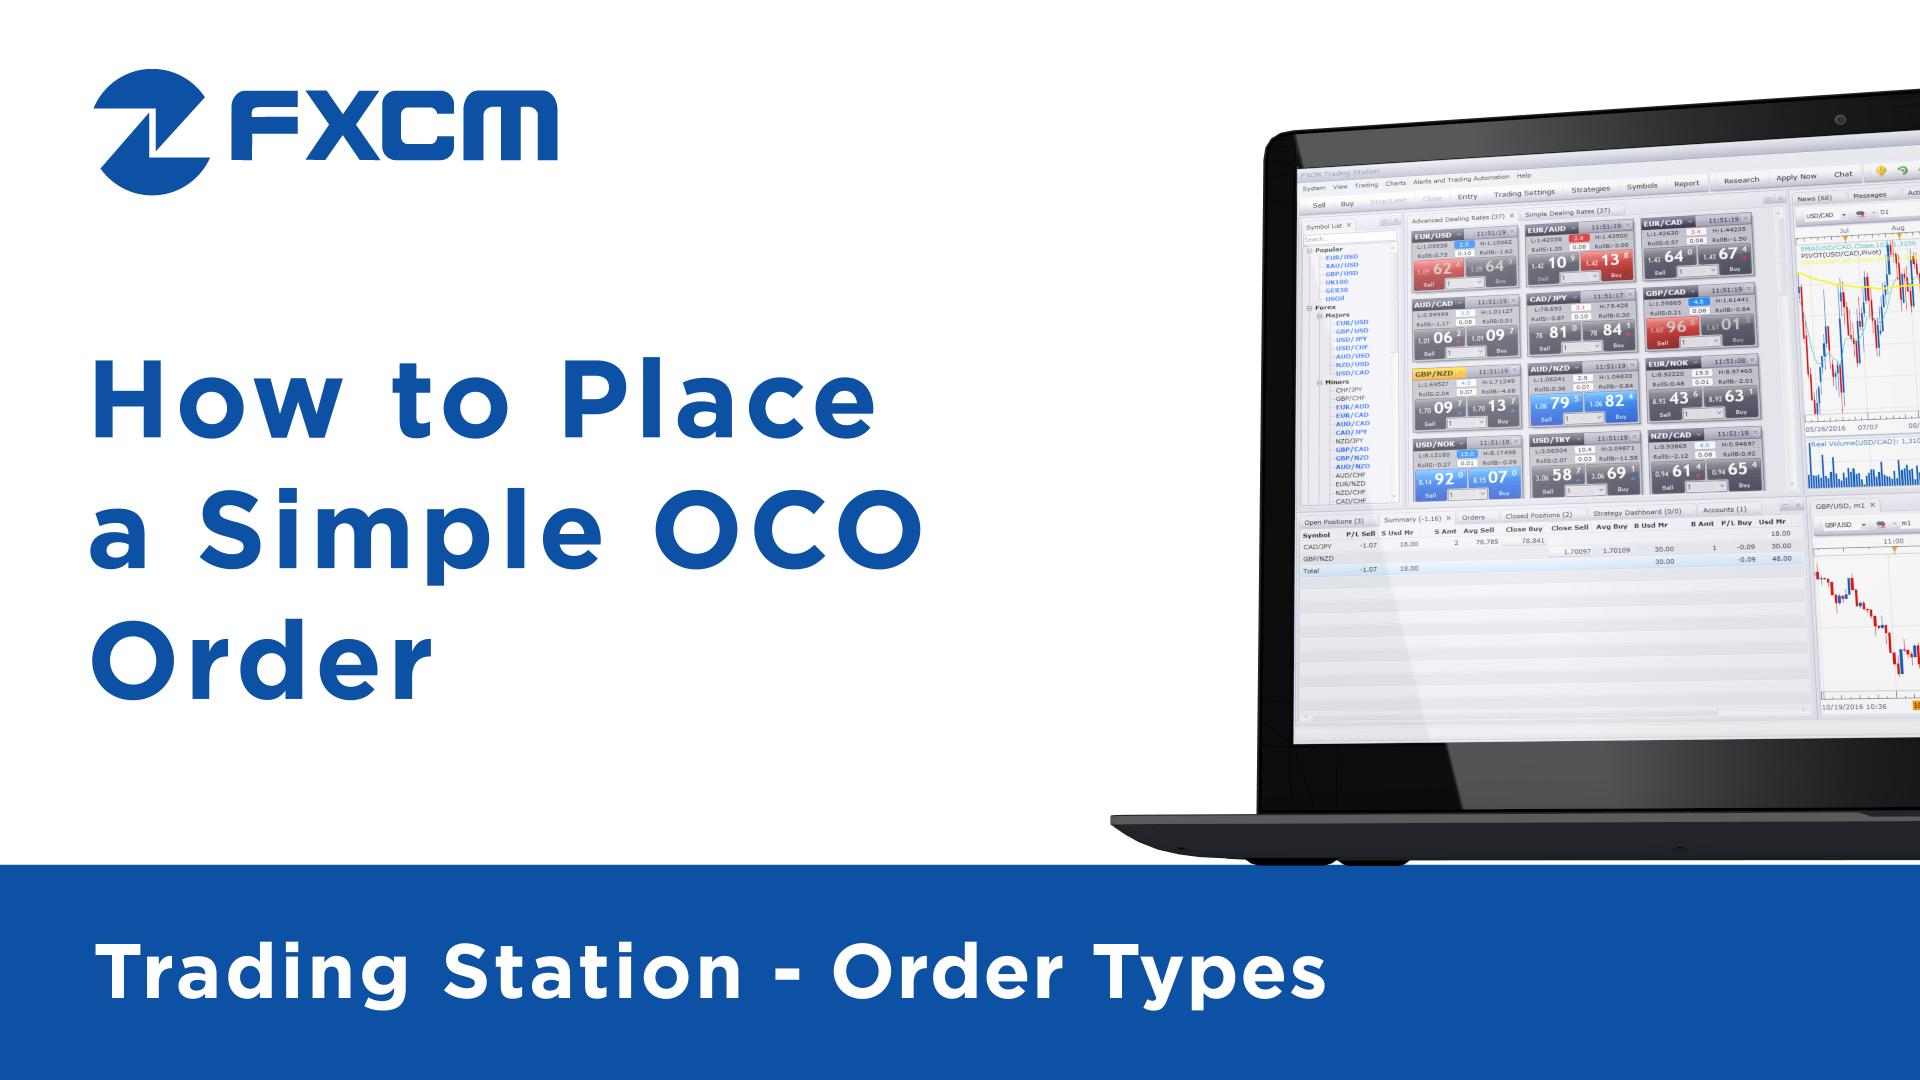 Simple OCO Order